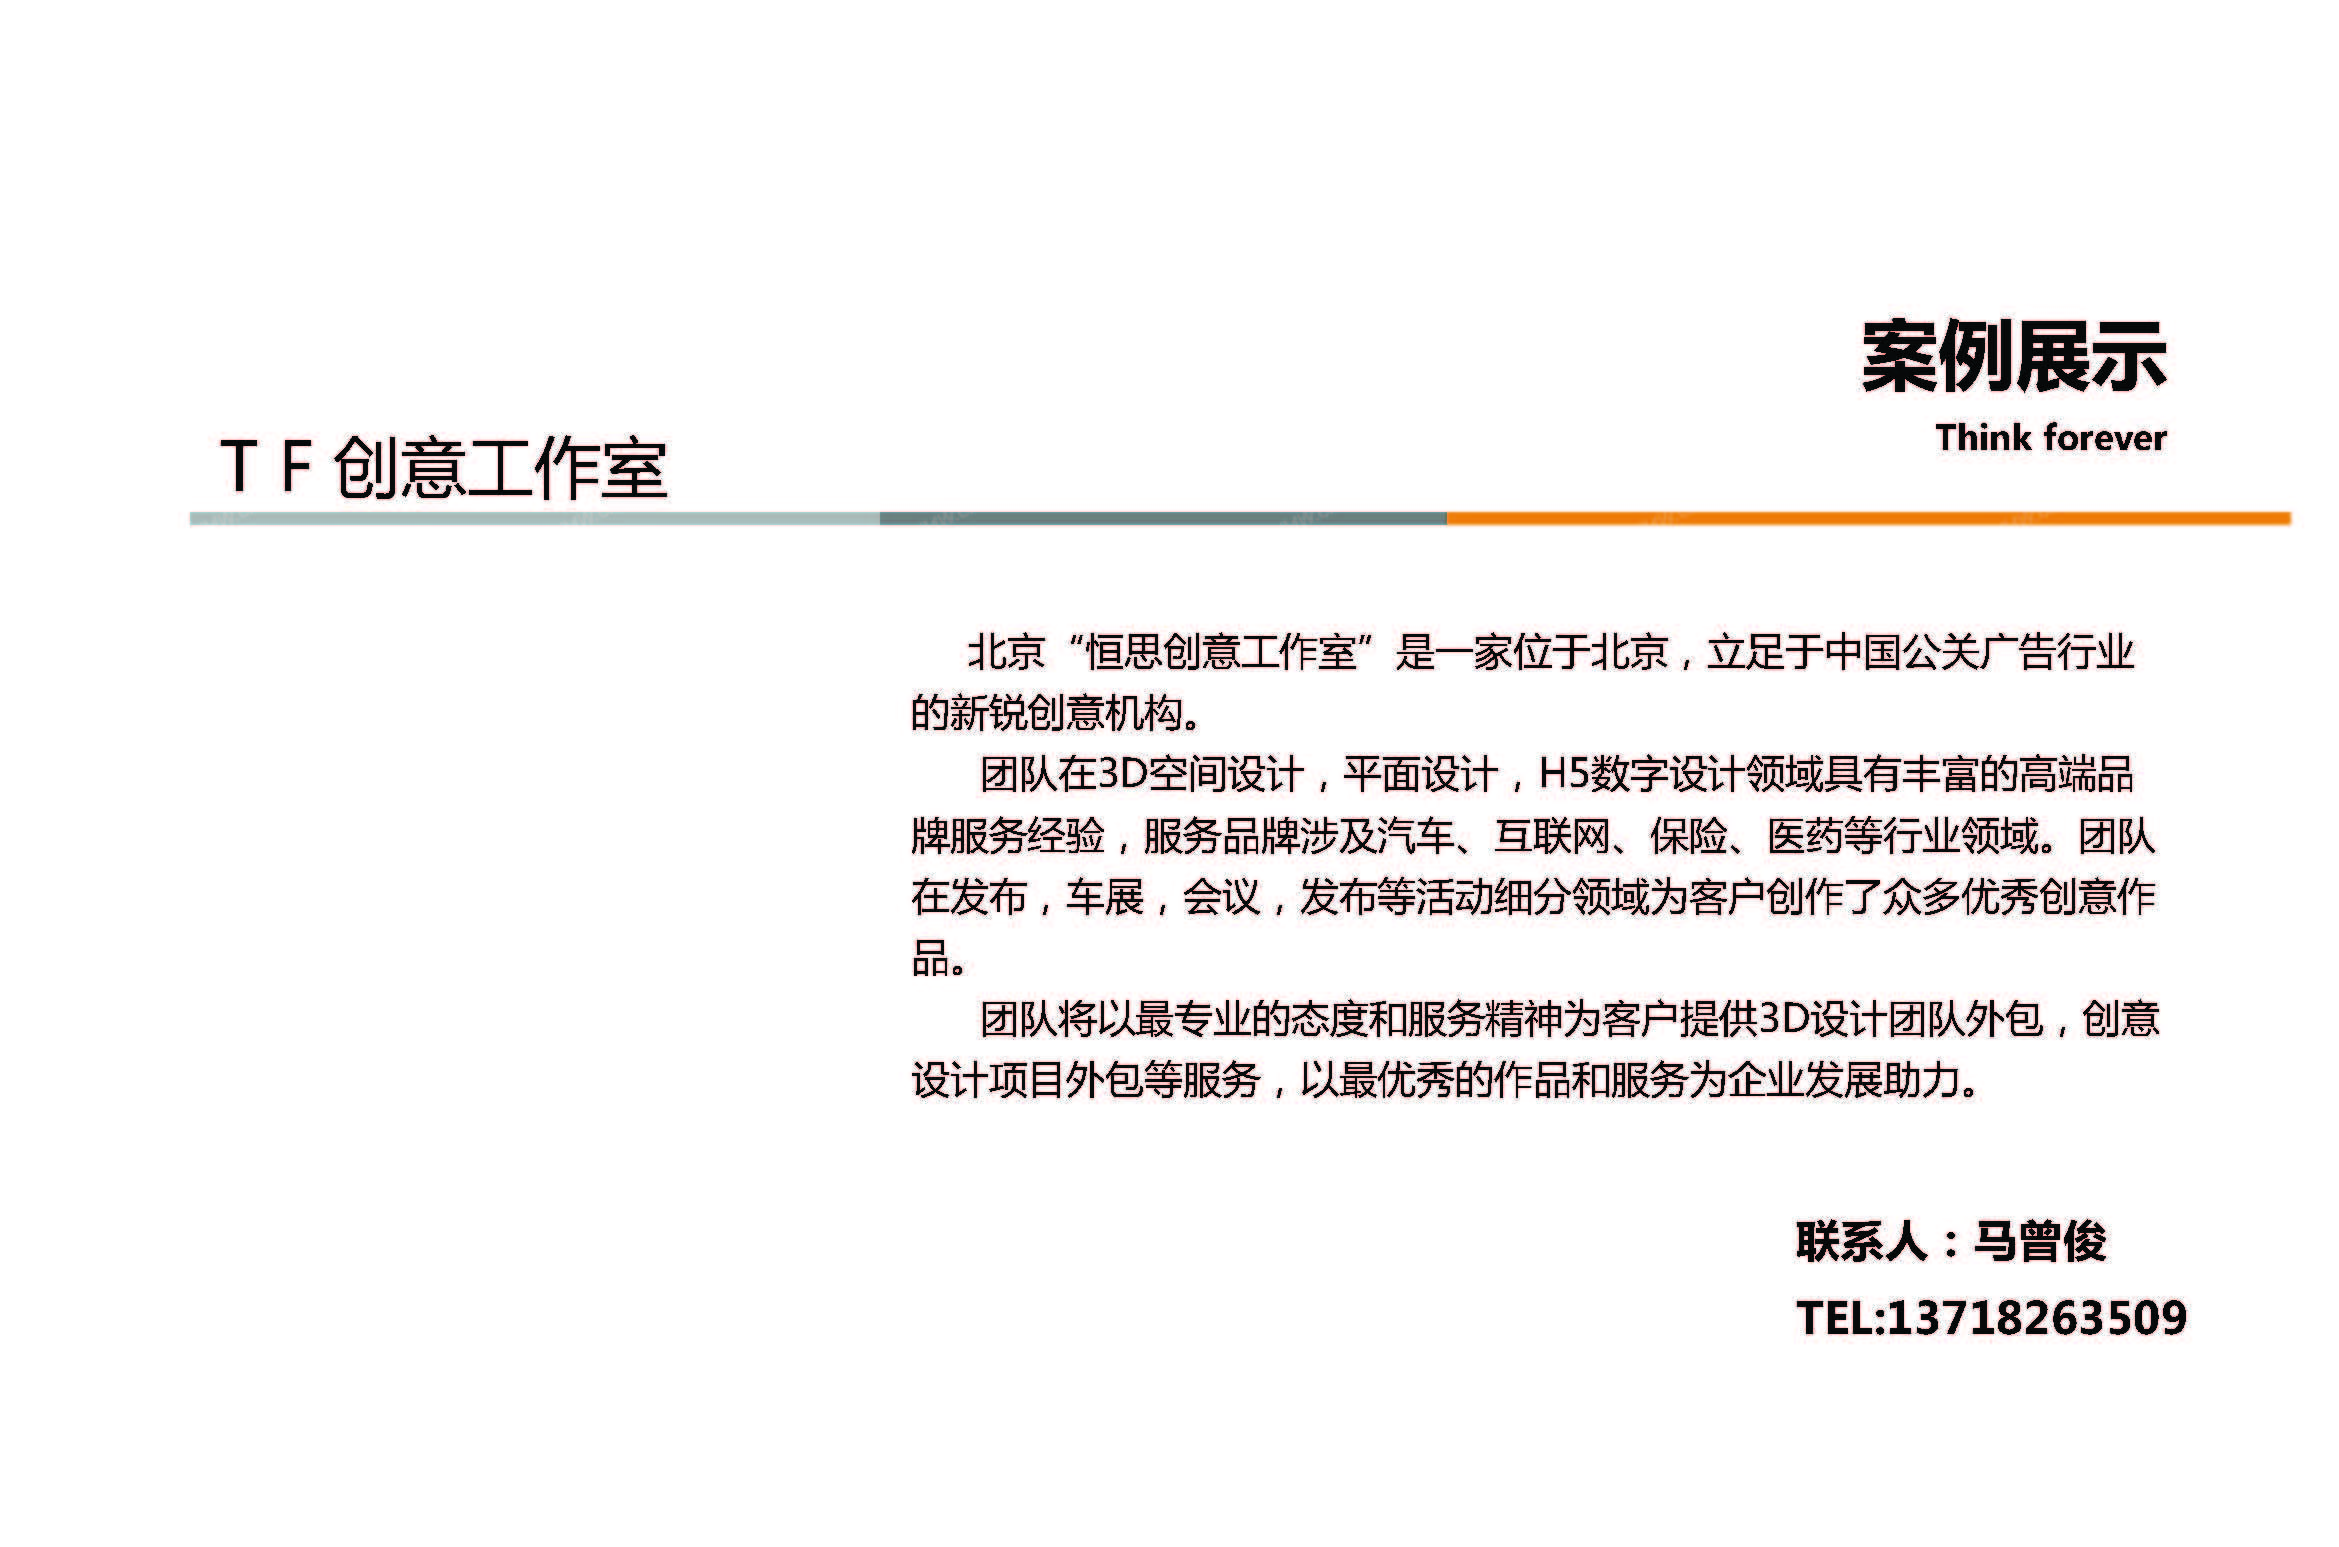 TF创意工作室简介_页面_01.jpg